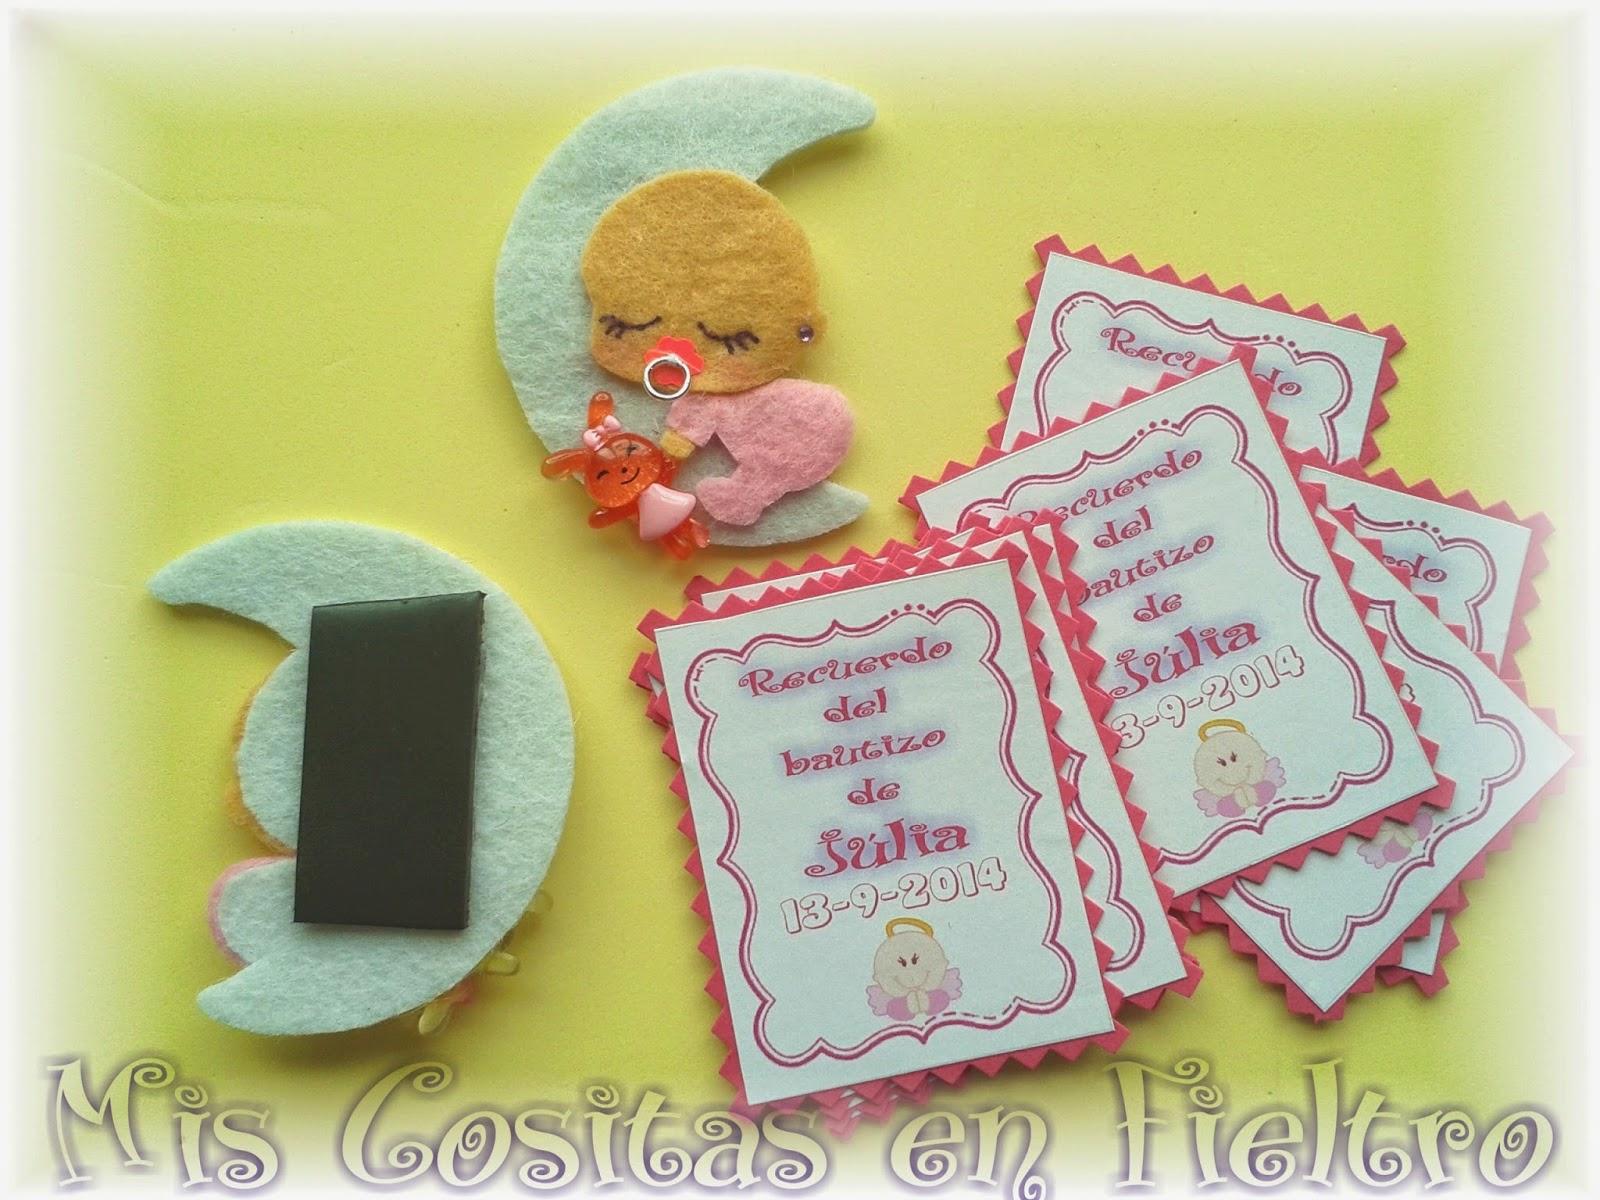 fieltro, imán, souvenir iman, regalo imán, imán bebé, bebé, bautizo, bautismo, souvenir, luna, invitados, detalle invitados